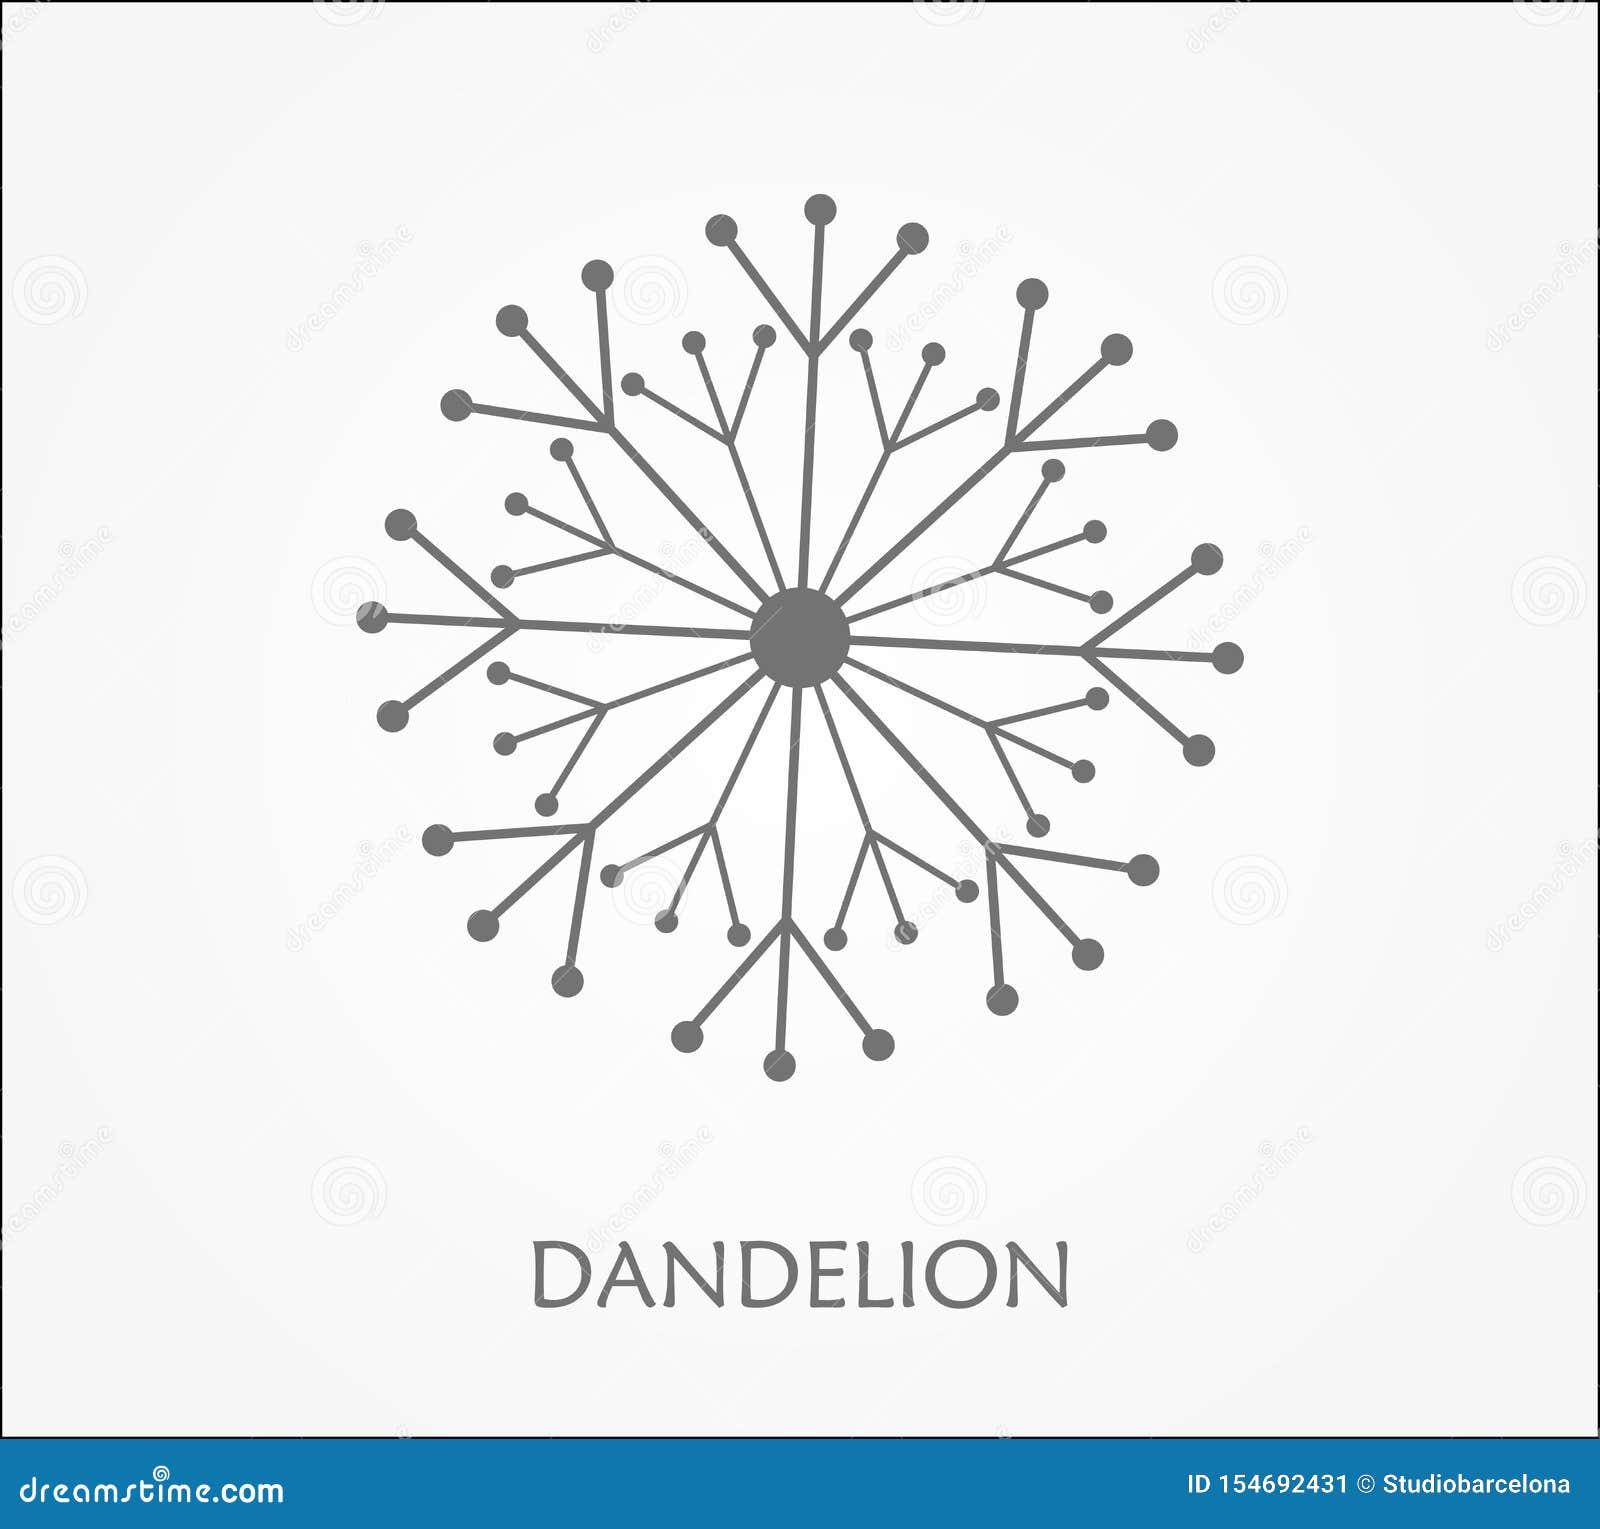 Dandelion Flower Symbol Stock Vector Illustration Of Meadow